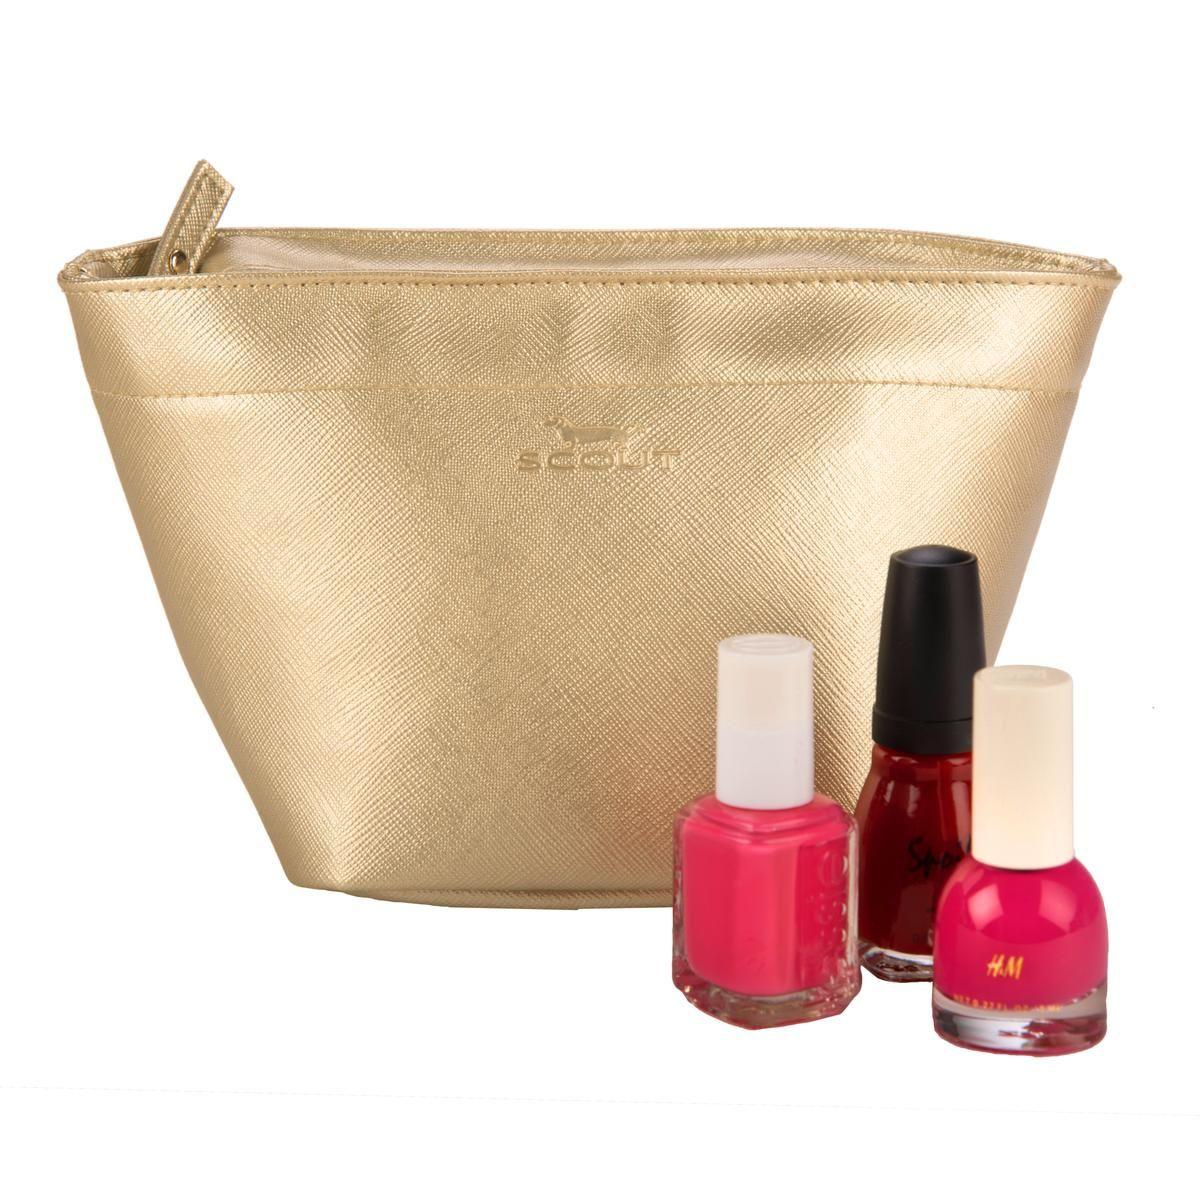 SCOUTCrown Jewels make up bag Makeup bag, Crown jewels